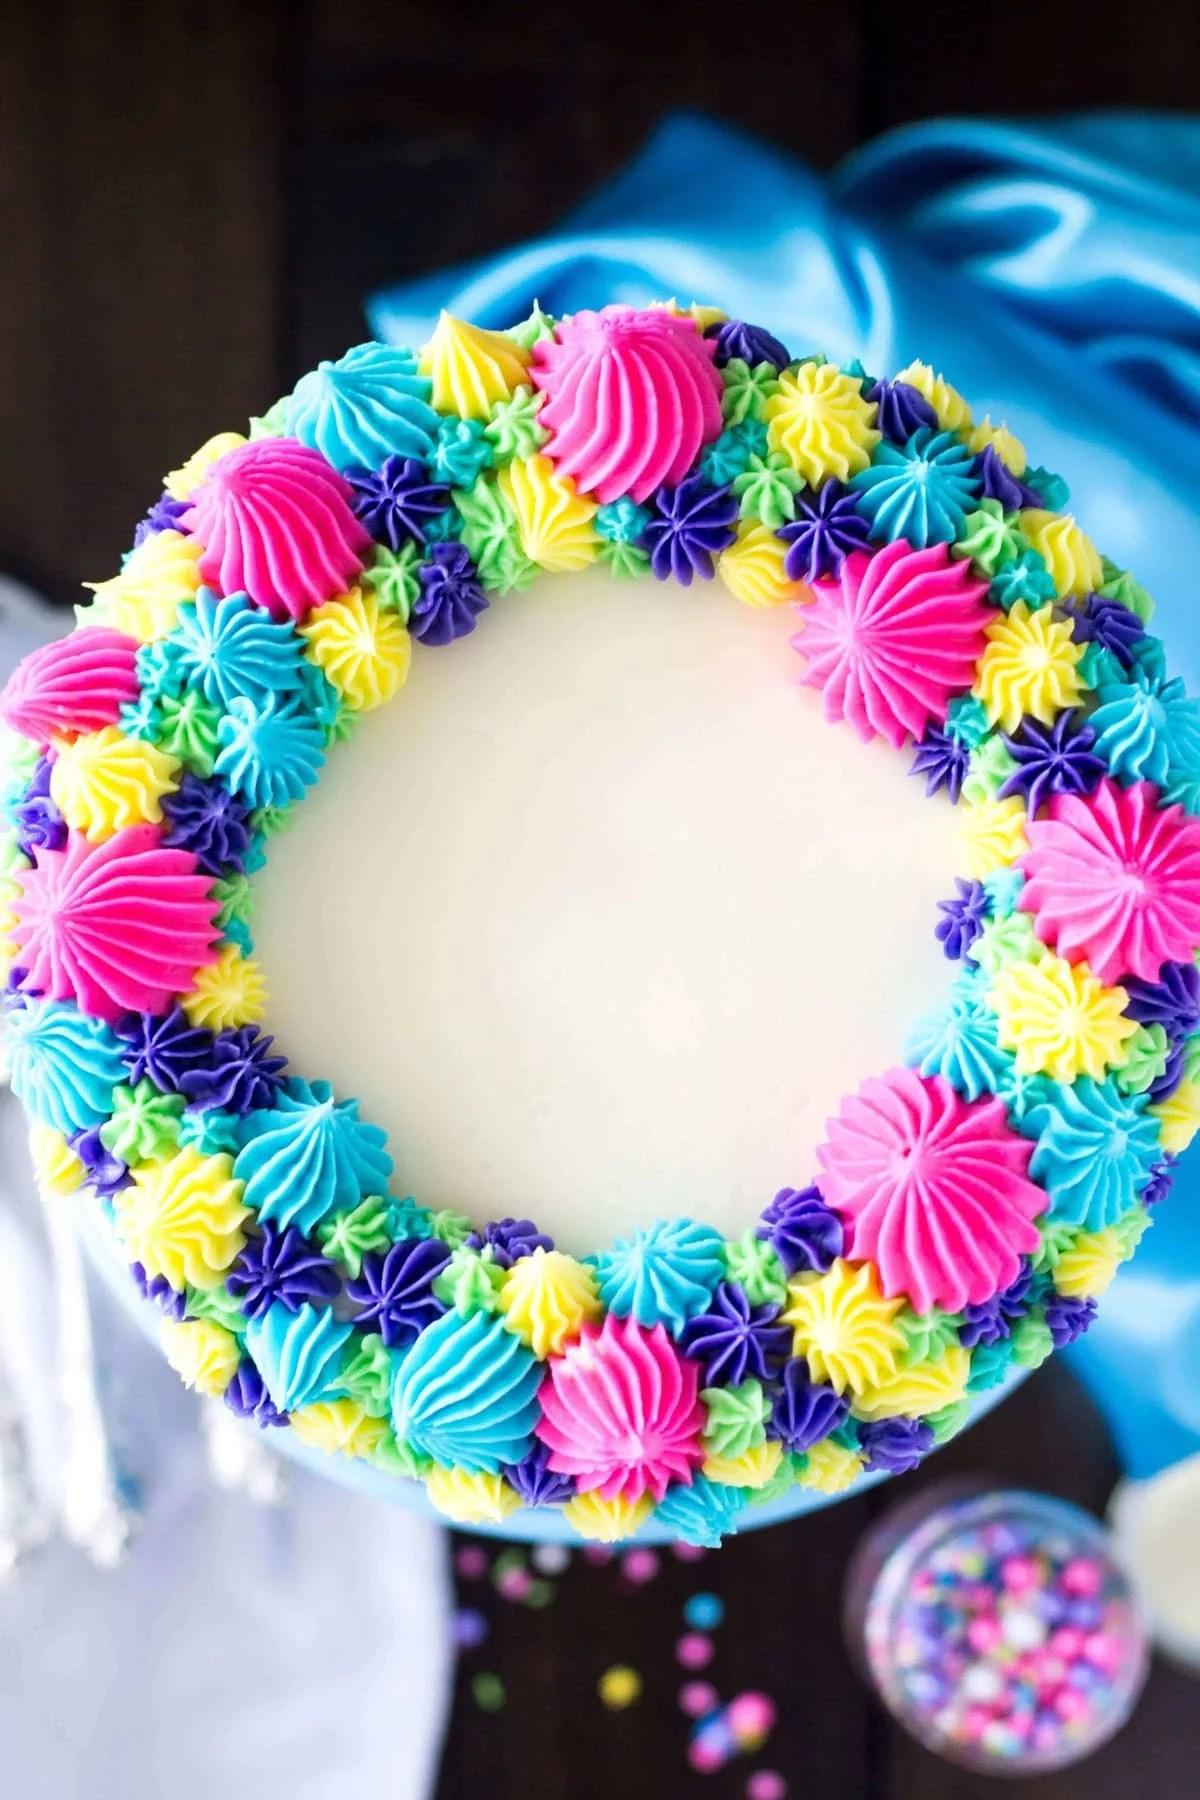 Funfetti Cake from Scratch (& A Very Merry Unbirthday) - Sugar Spun ...